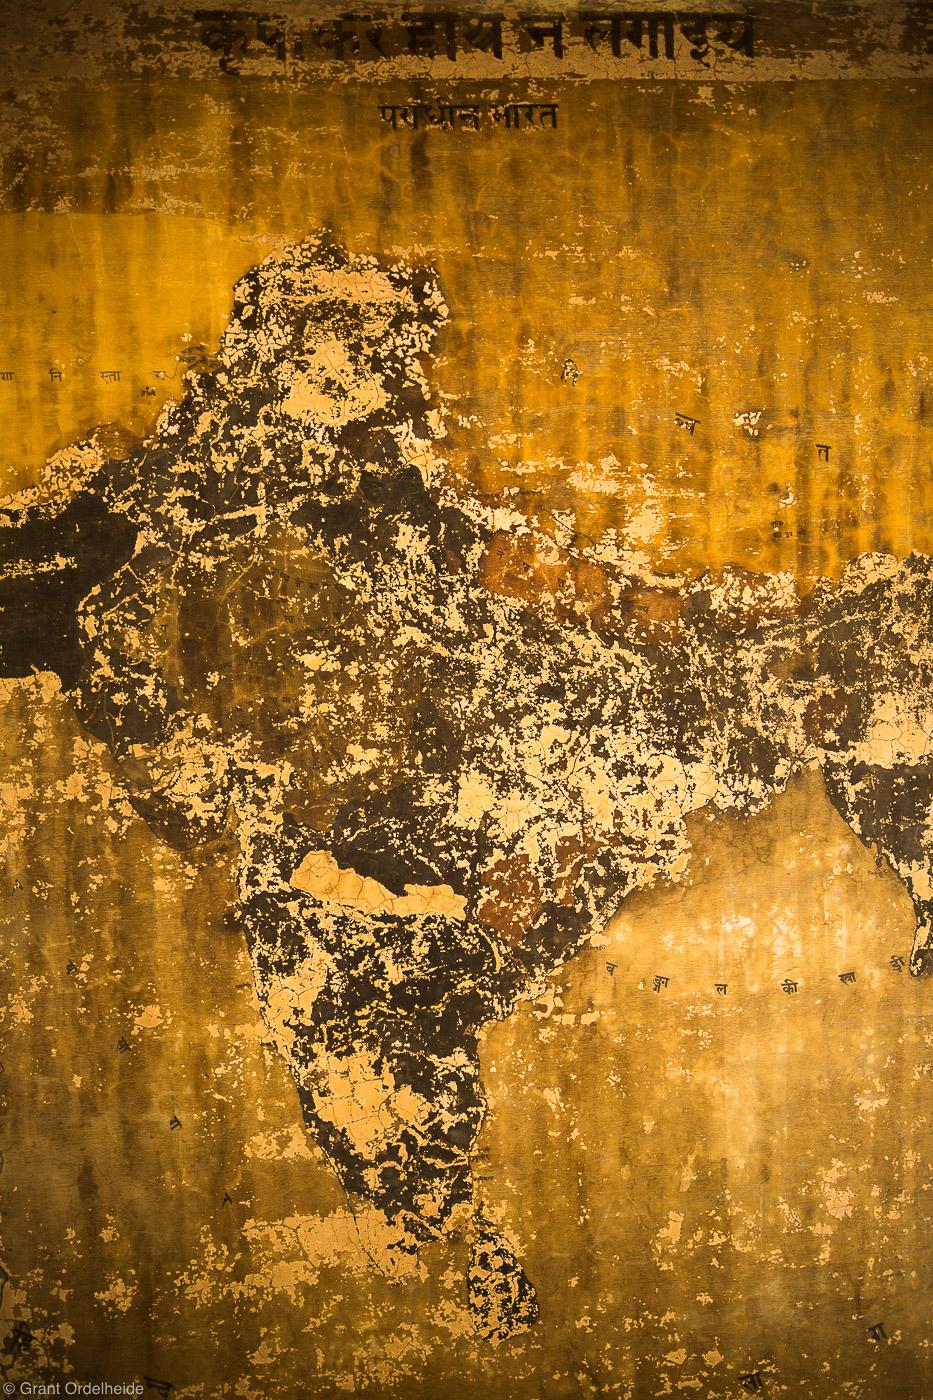 india, old, peeling, painting, temple, holy, city, varanasi, map, Hindu, photo